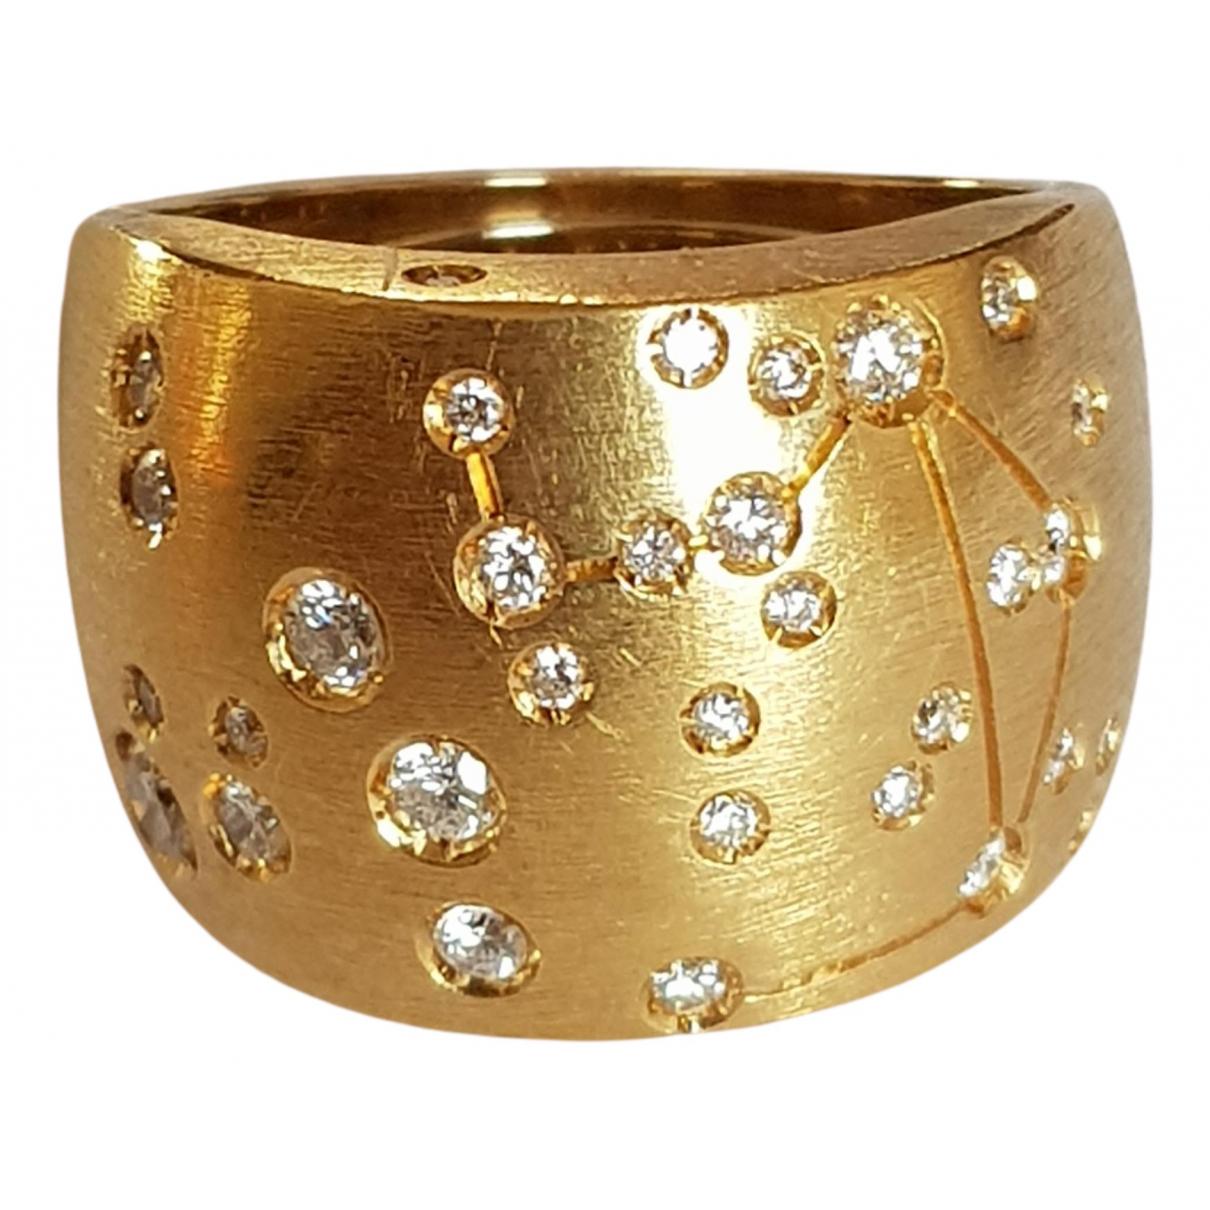 Repossi - Bague   pour femme en or jaune - jaune